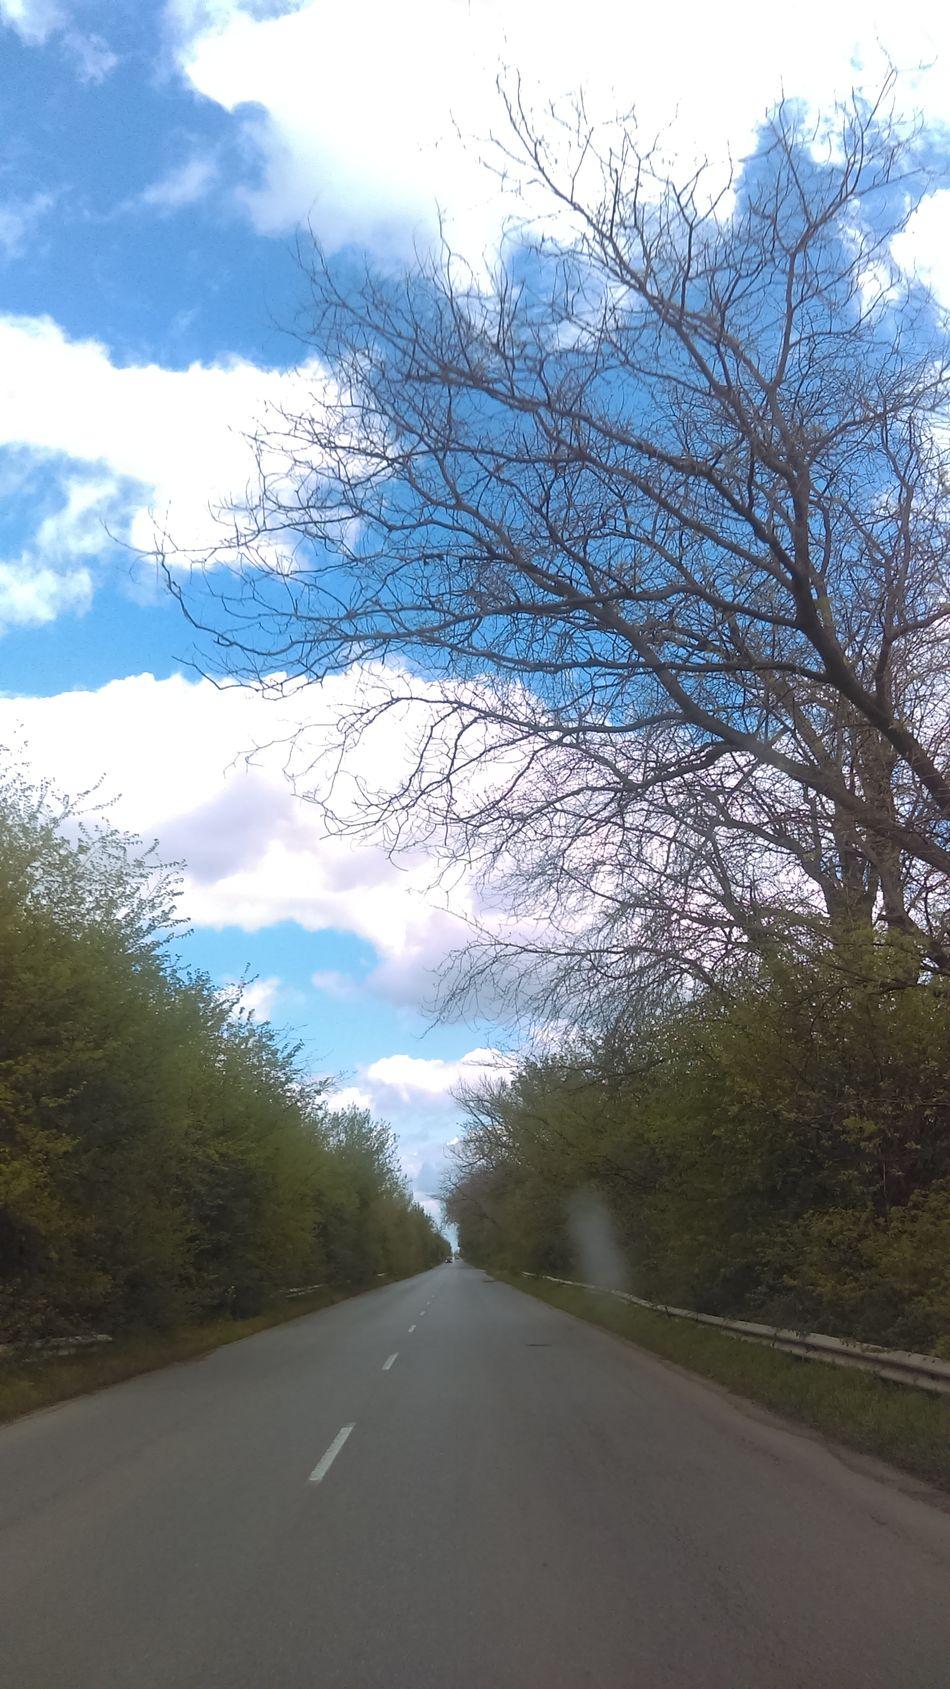 On The Road Road Cloud - Sky Sky Tree Roadtrip Roadtrips Enjoying Life